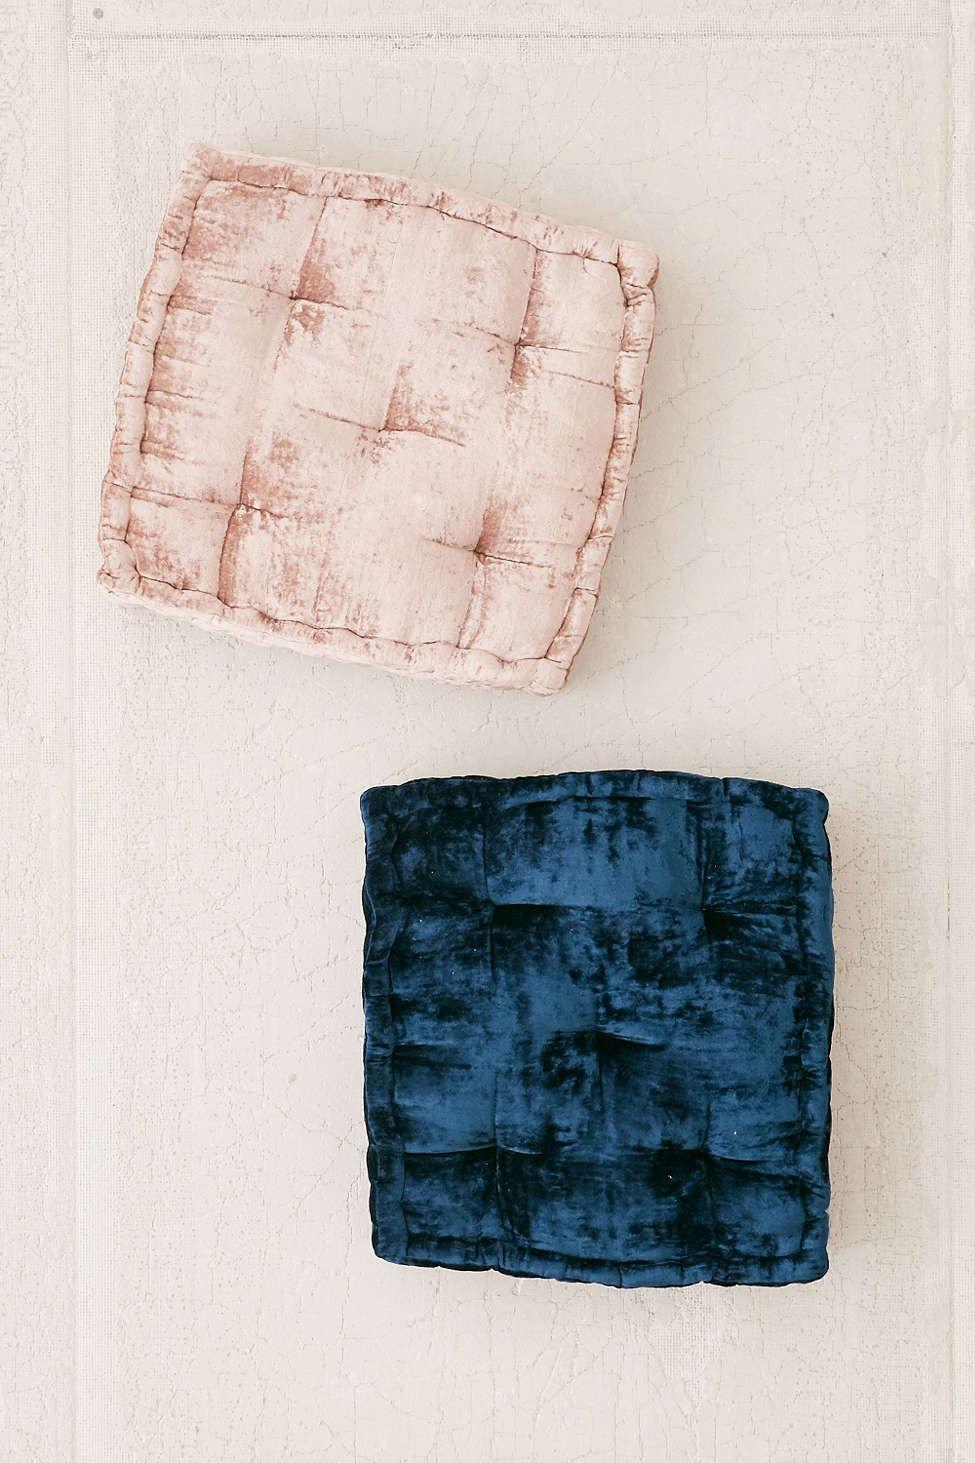 Ruthie Velvet Floor Pillow | Floor pillows, Pillows and Apartments